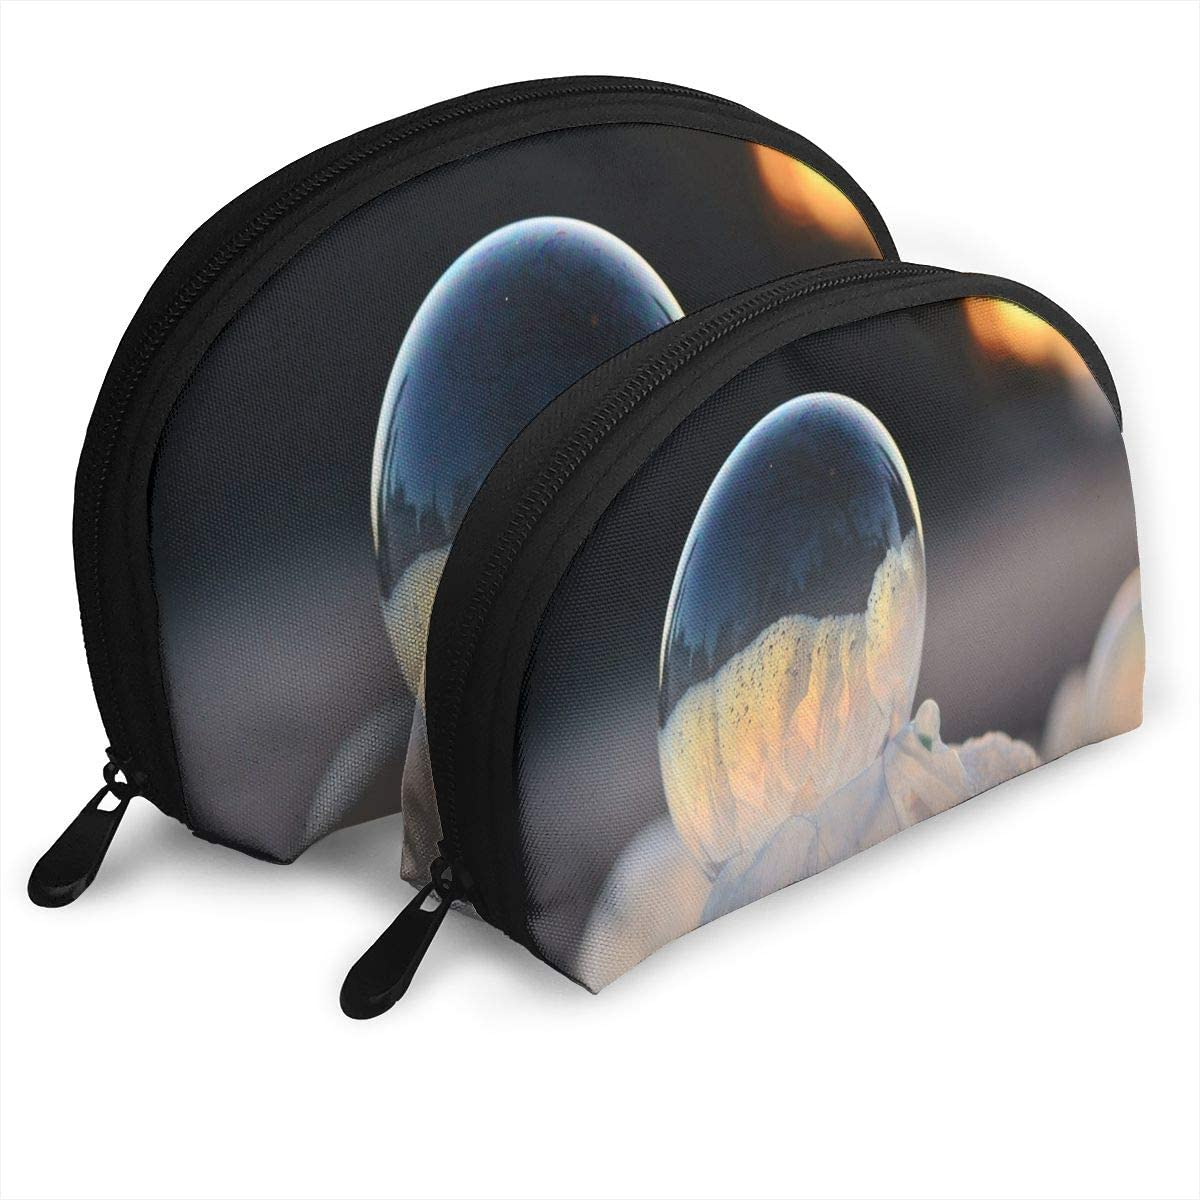 Pouch Zipper Toiletry Organizer Travel Makeup Clutch Bag Frozen In A Bubble Portable Bags Clutch Pouch Storage Bags